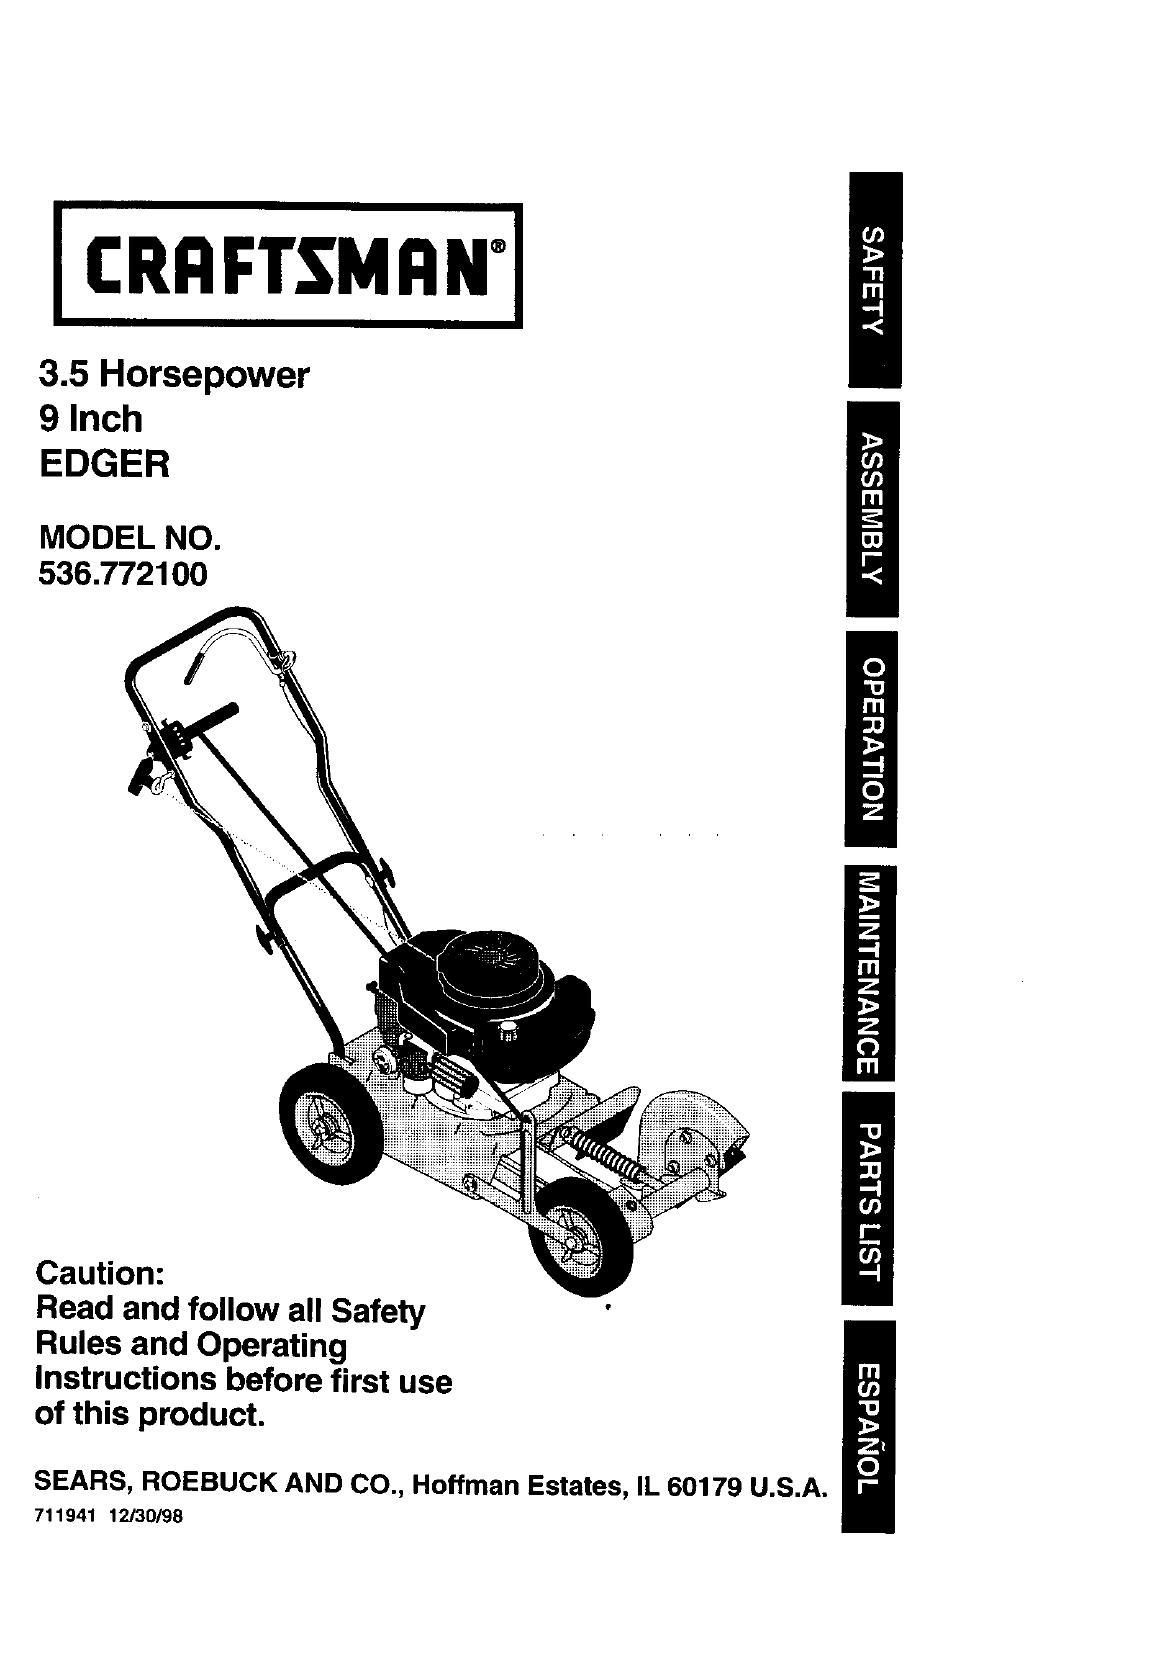 Craftsman 536772100 User Manual EDGER Manuals And Guides